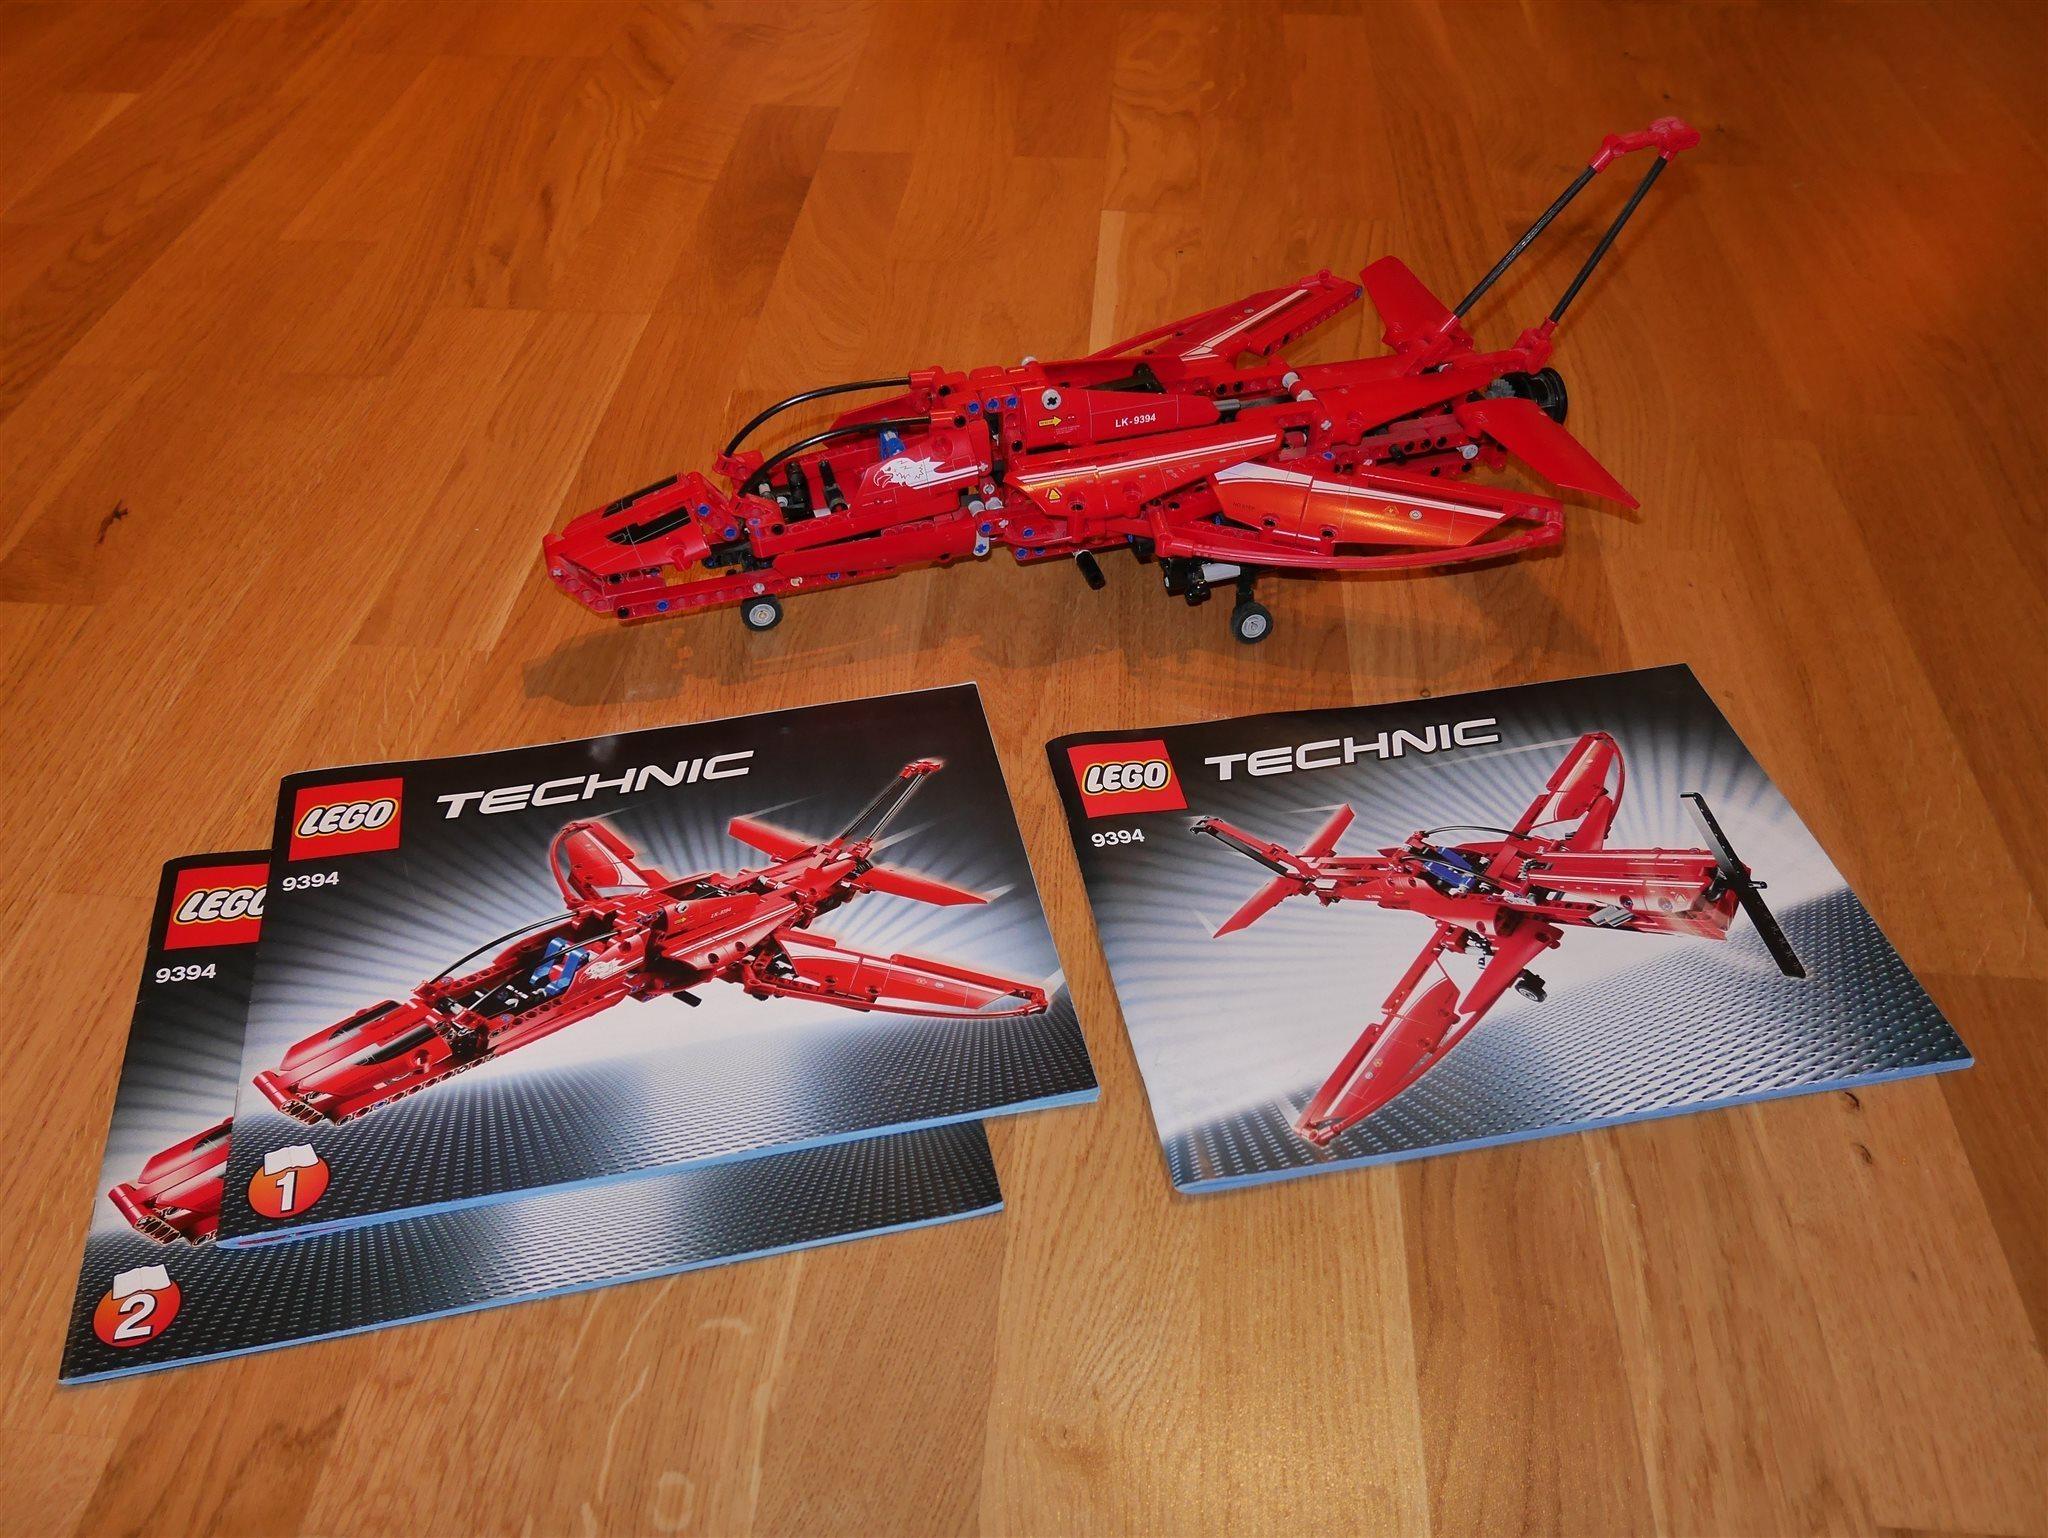 LEGO Technic 9394 Jetplan